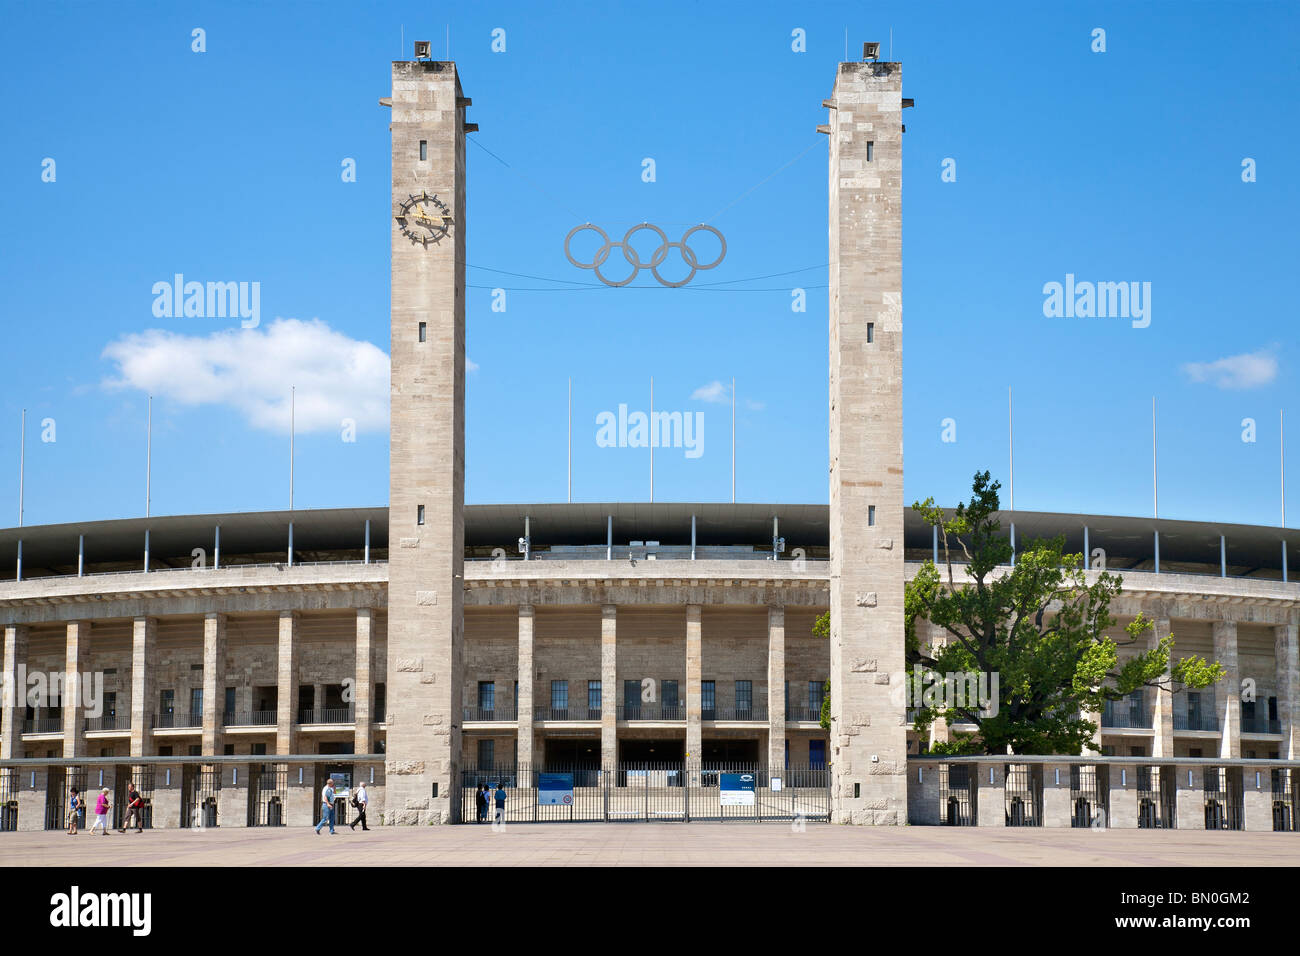 Olympic Stadium, Berlin, Germany - Stock Image